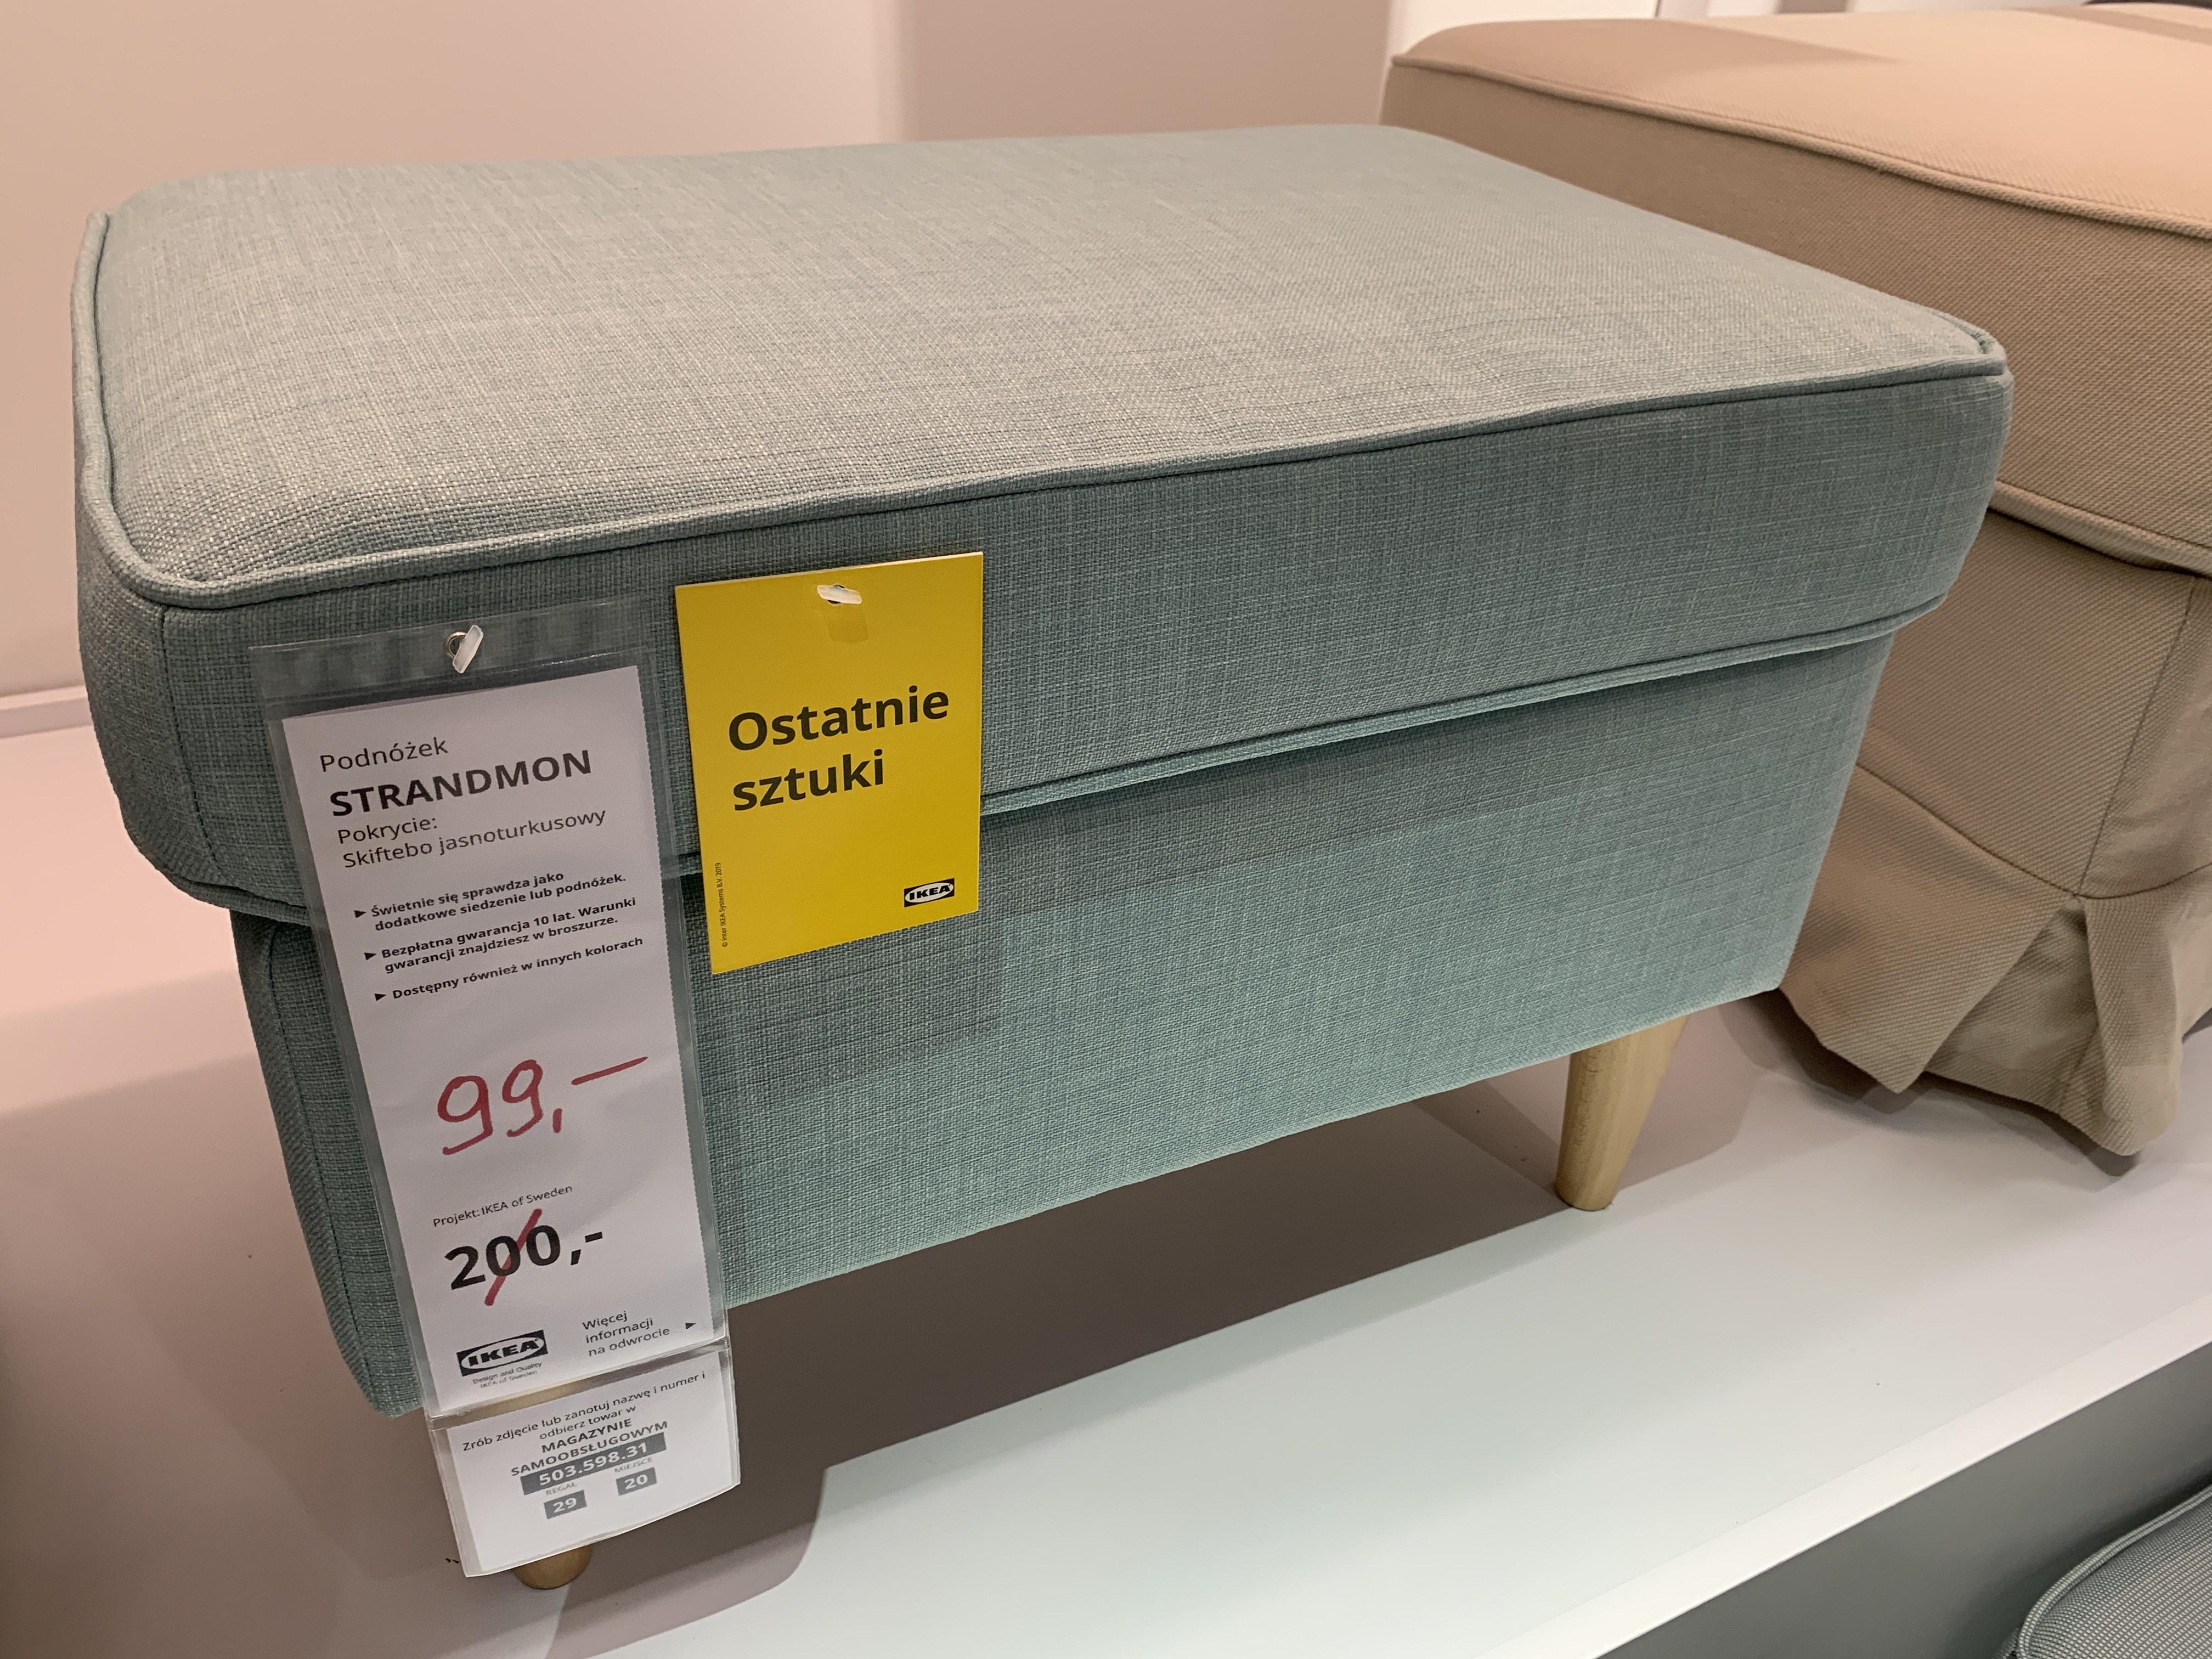 Podnóżek Strandmon IKEA Lublin